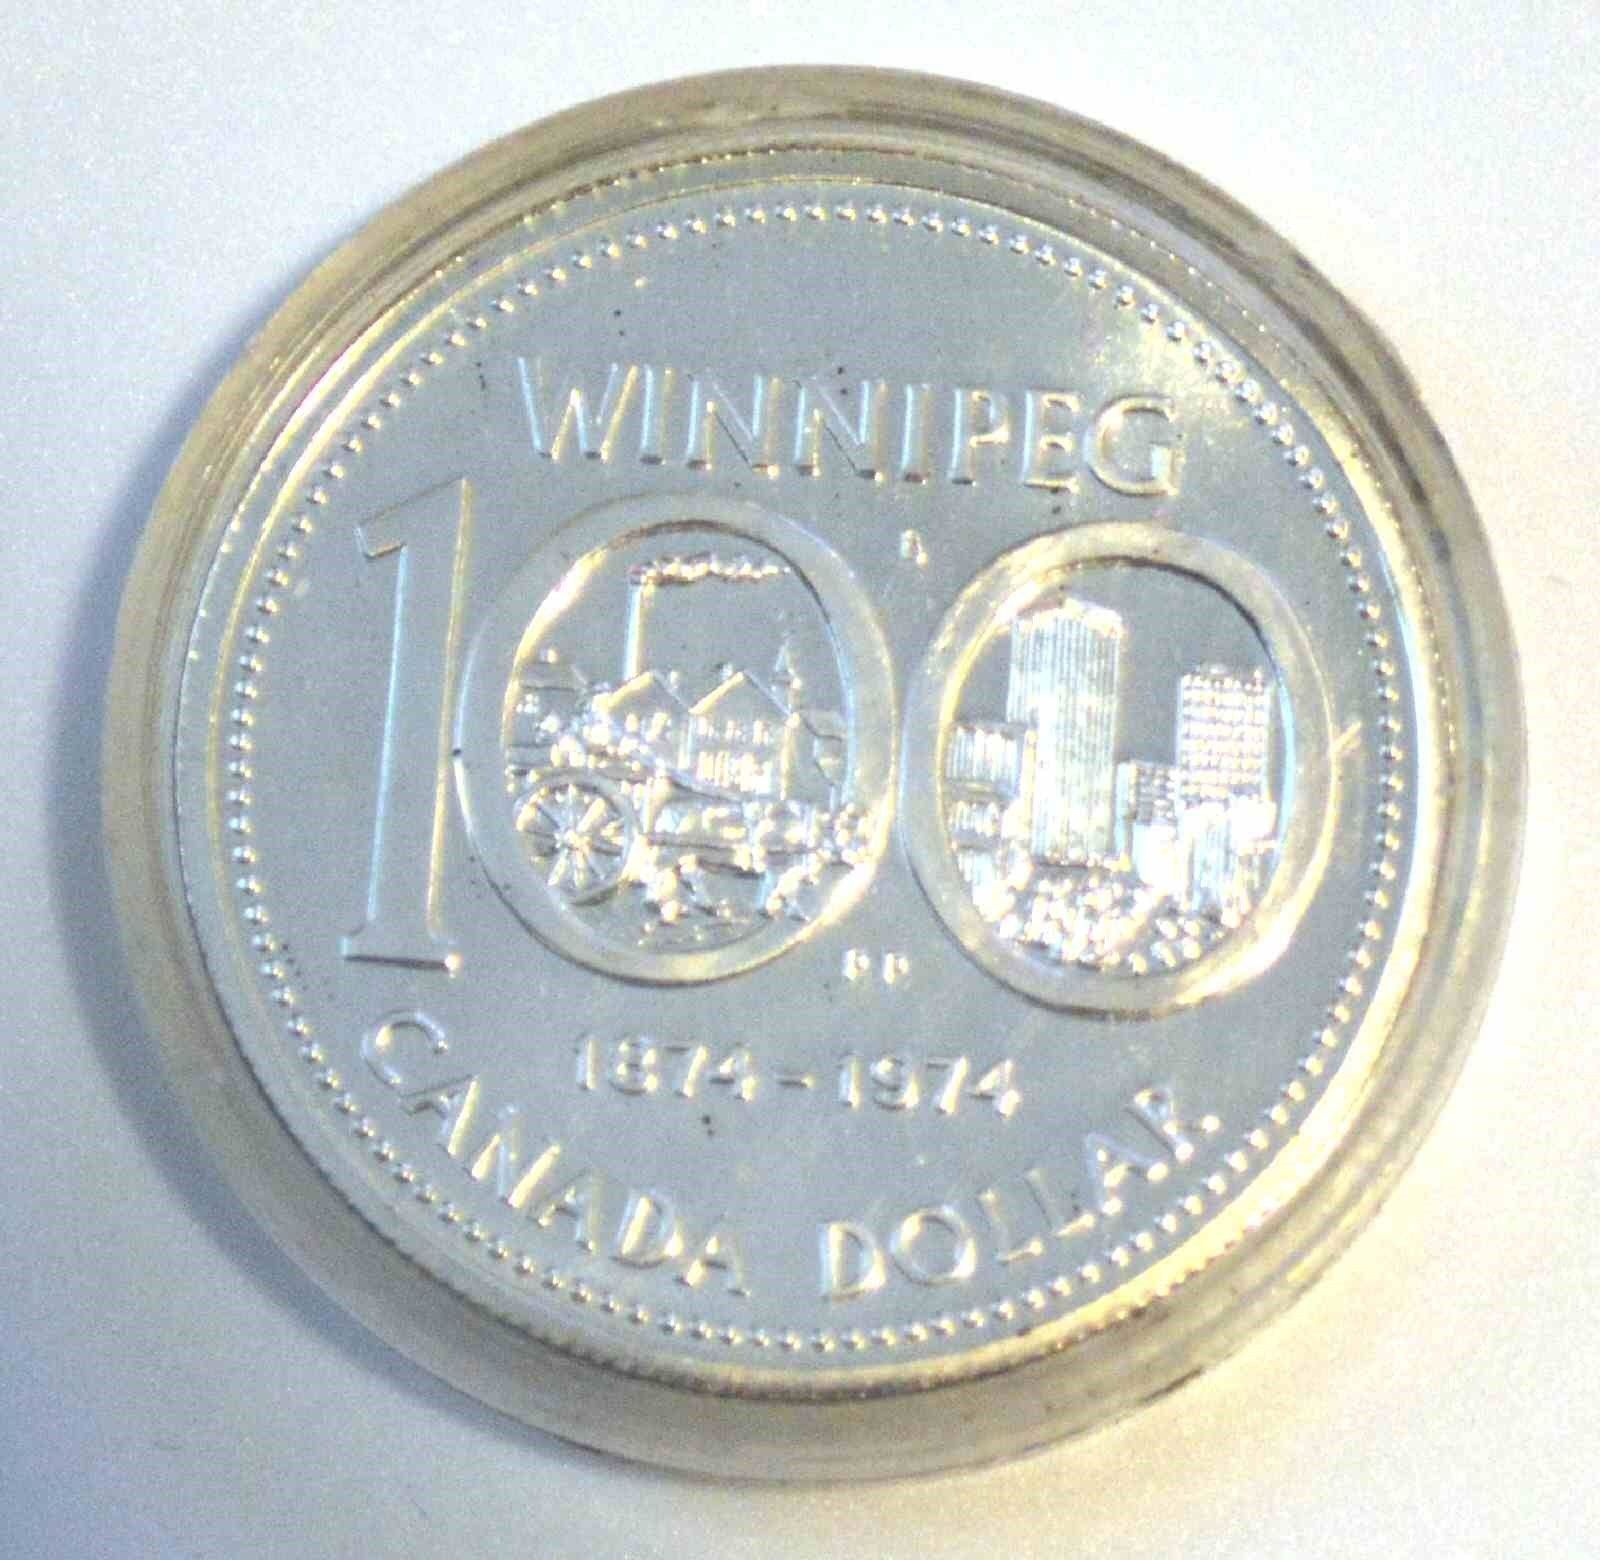 1987 Canadian 1 Dollar Silver Coin Winnipeg 100 Shopnetone Silver Coins Coins Silver